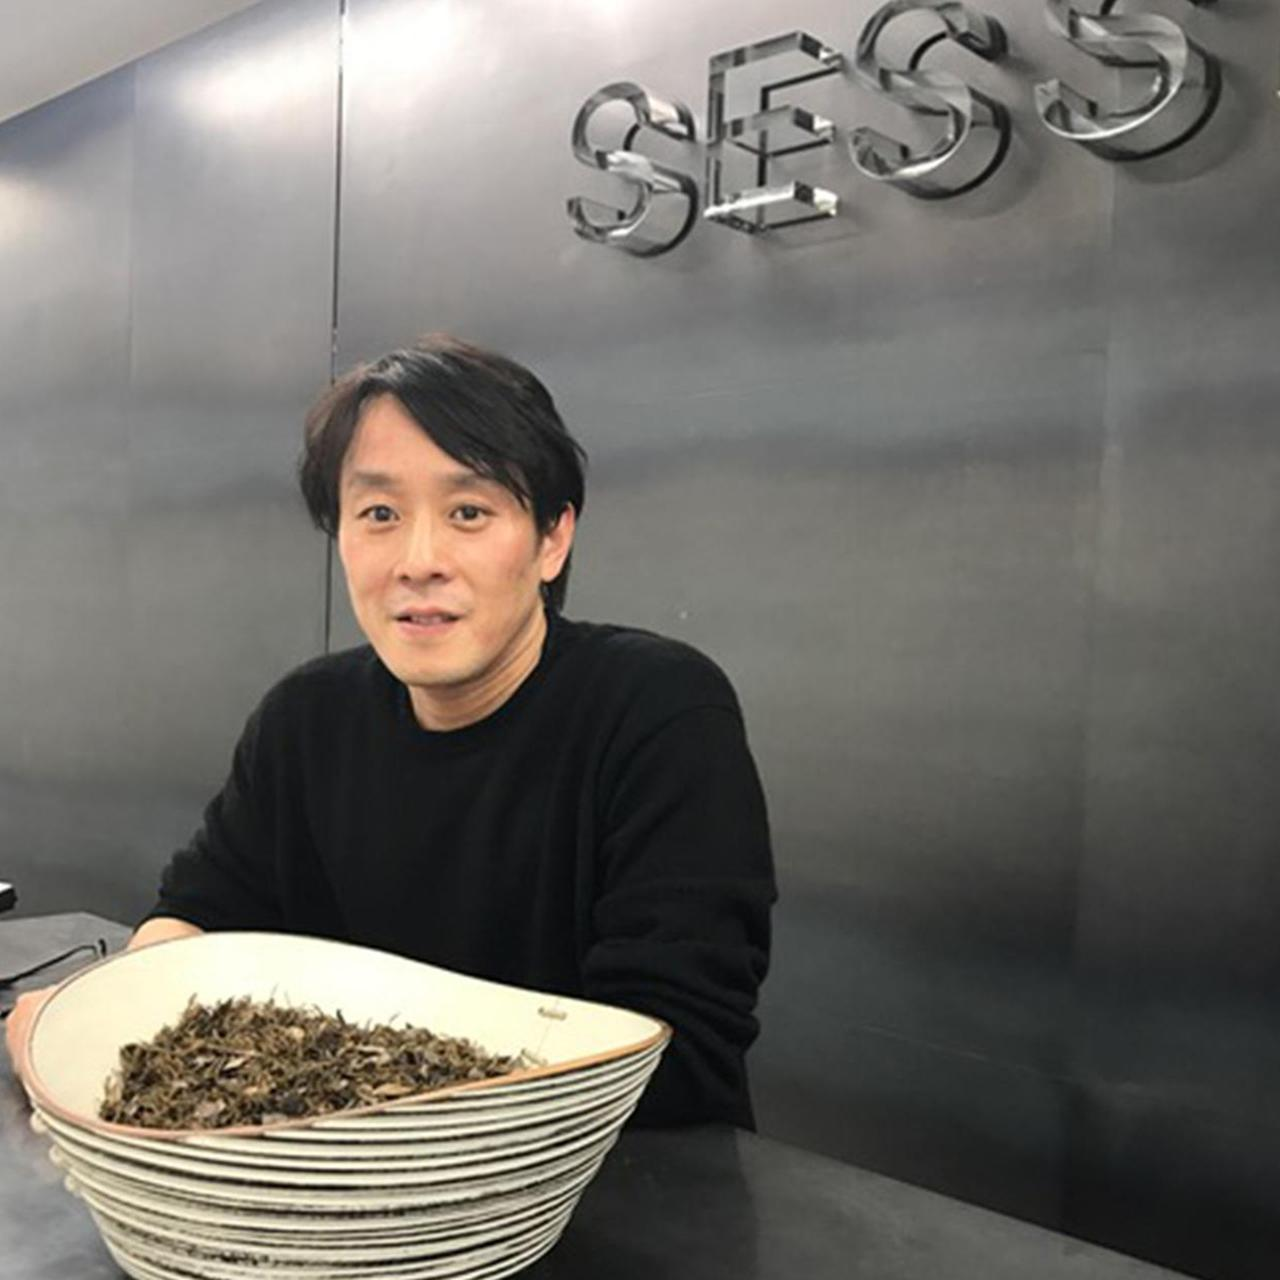 Images : 上杉文弥さん